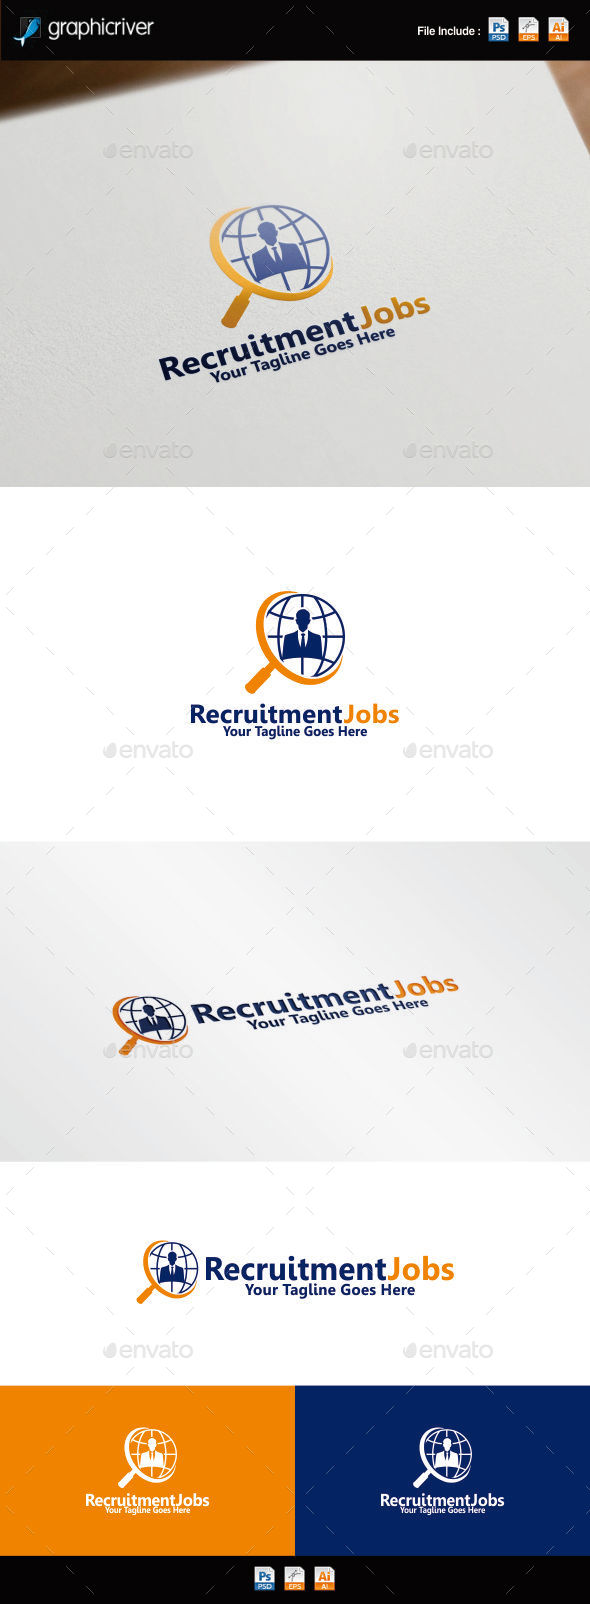 GraphicRiver Recruitment Jobs Logo 8837732